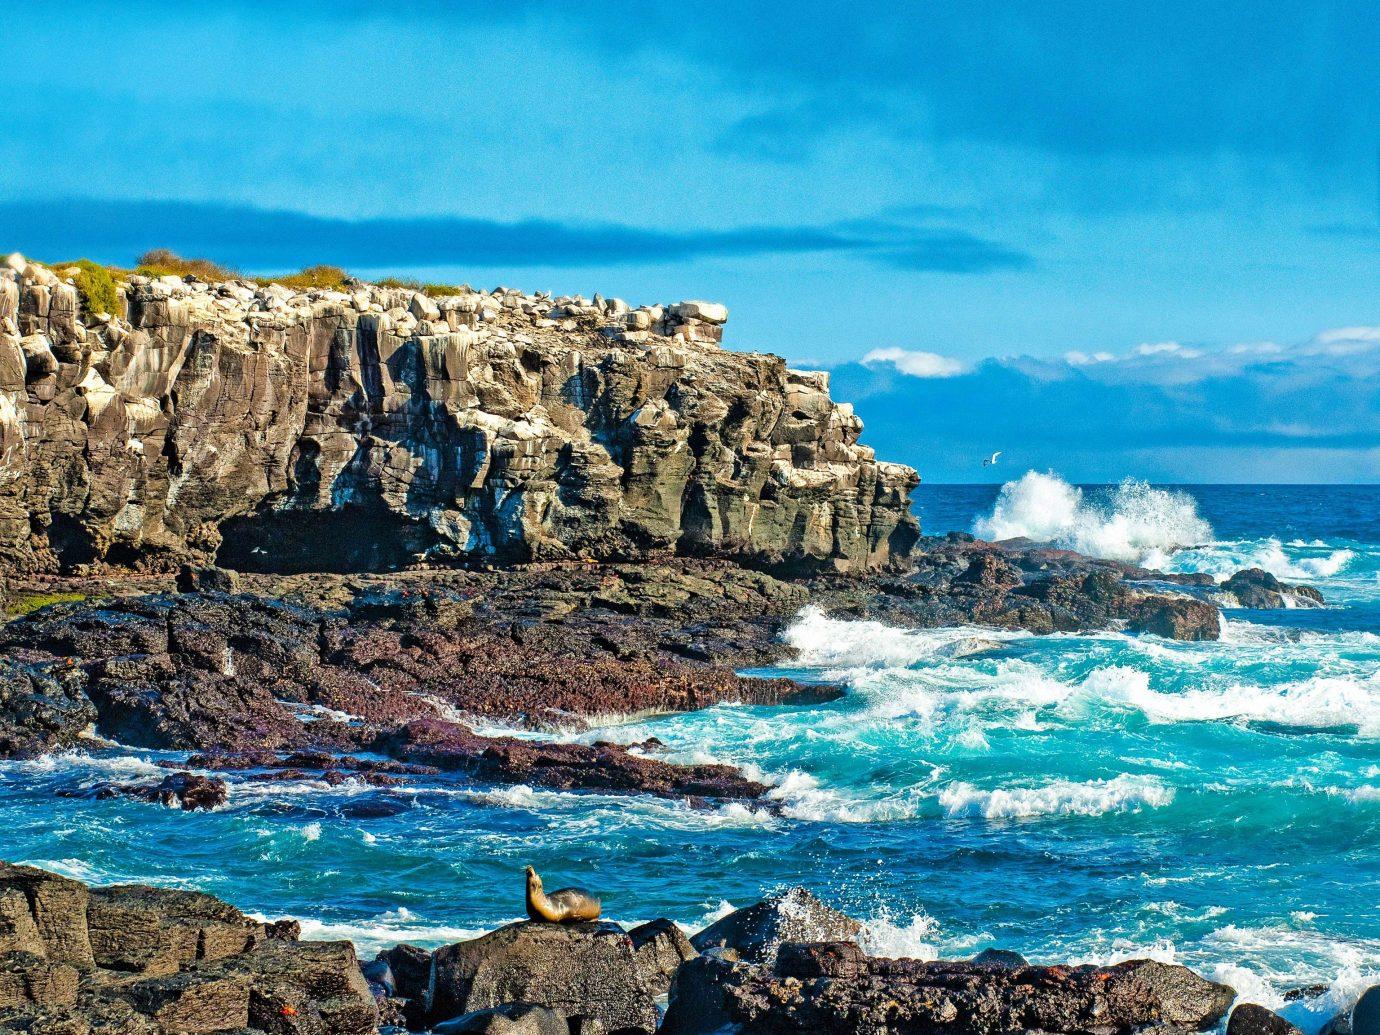 Sea Coast coastal and oceanic landforms sky shore Ocean rock promontory headland cliff cape wave terrain formation water tourism klippe bay islet cove